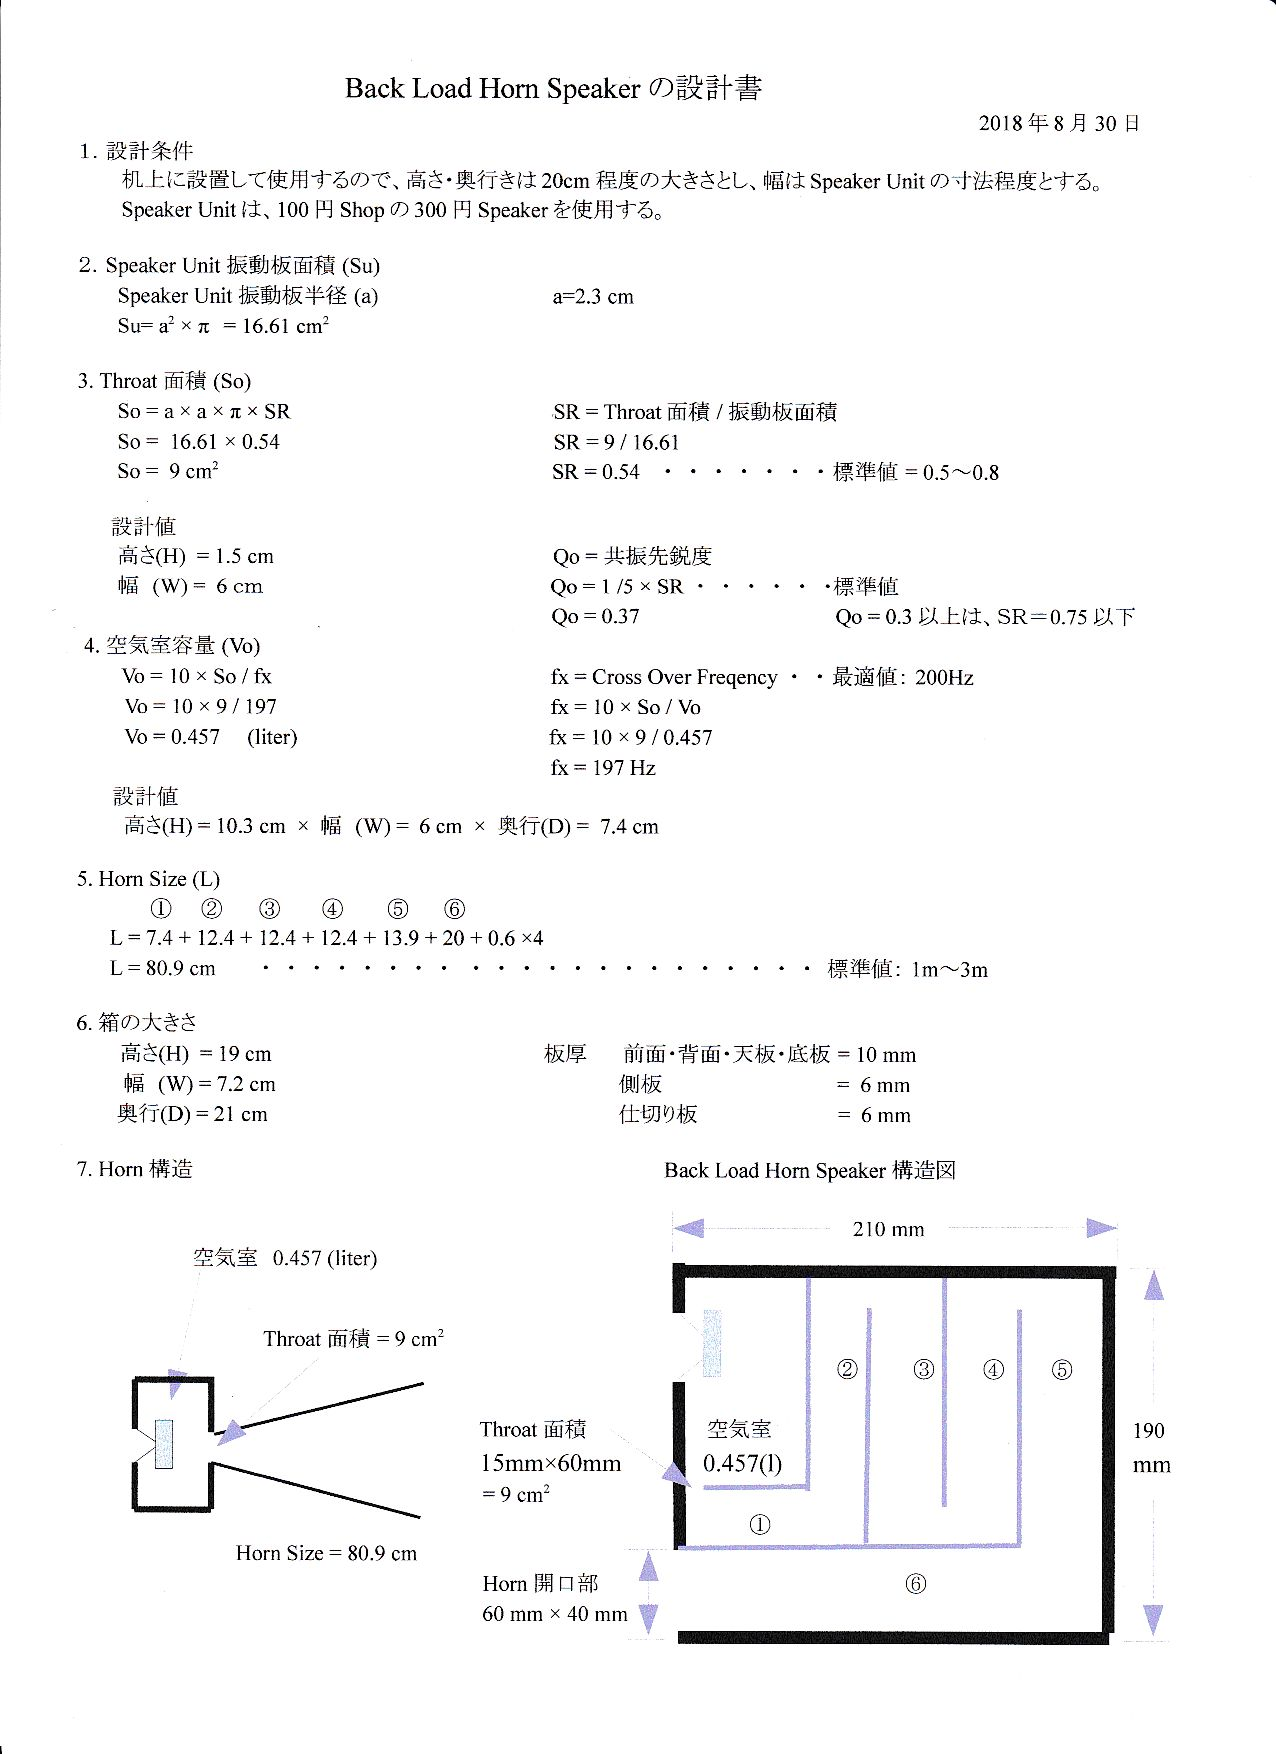 Horn Design01_180830